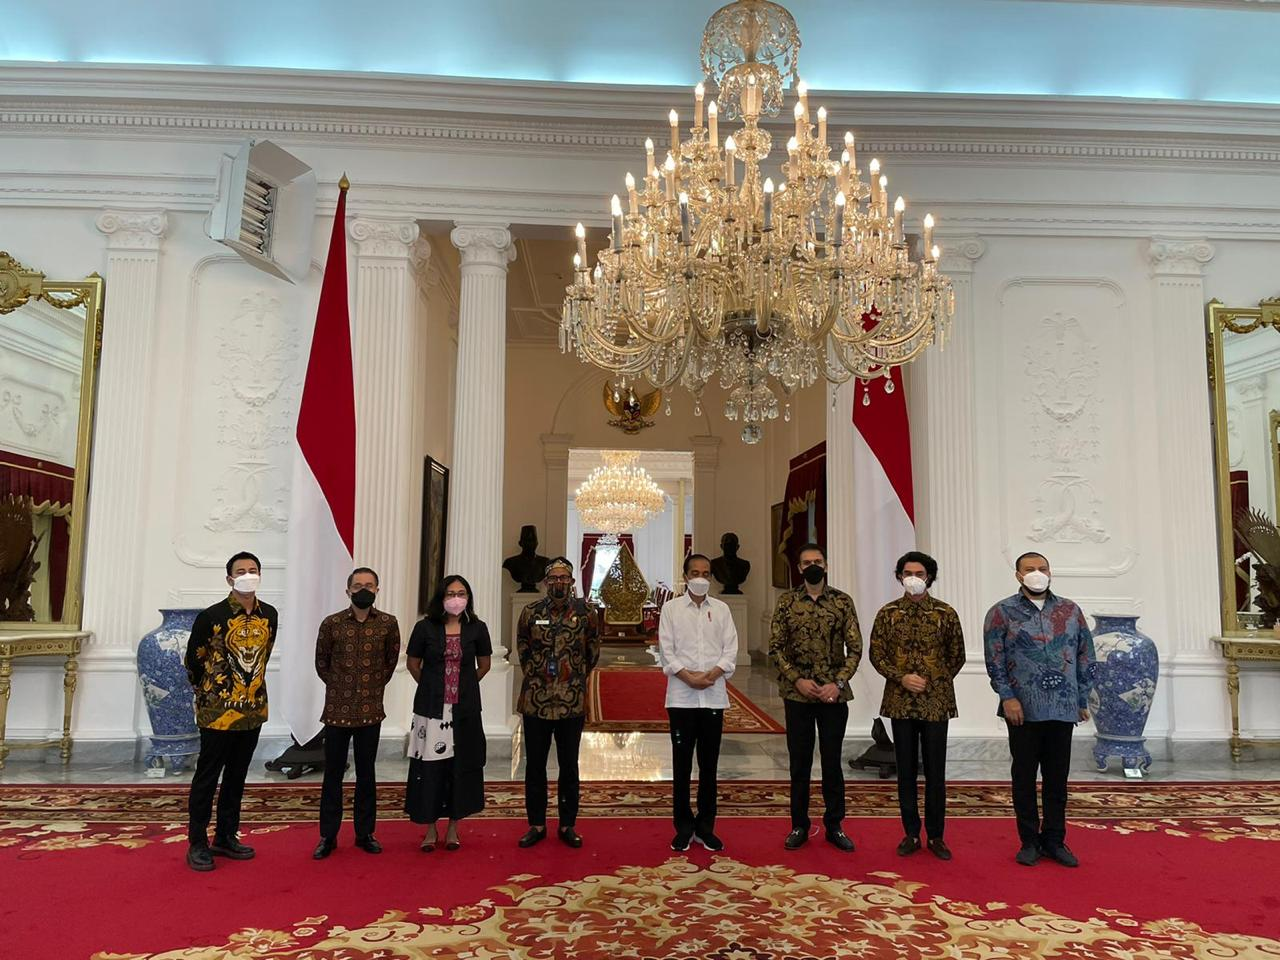 berdialog dengan Presiden @jokowi di Istana